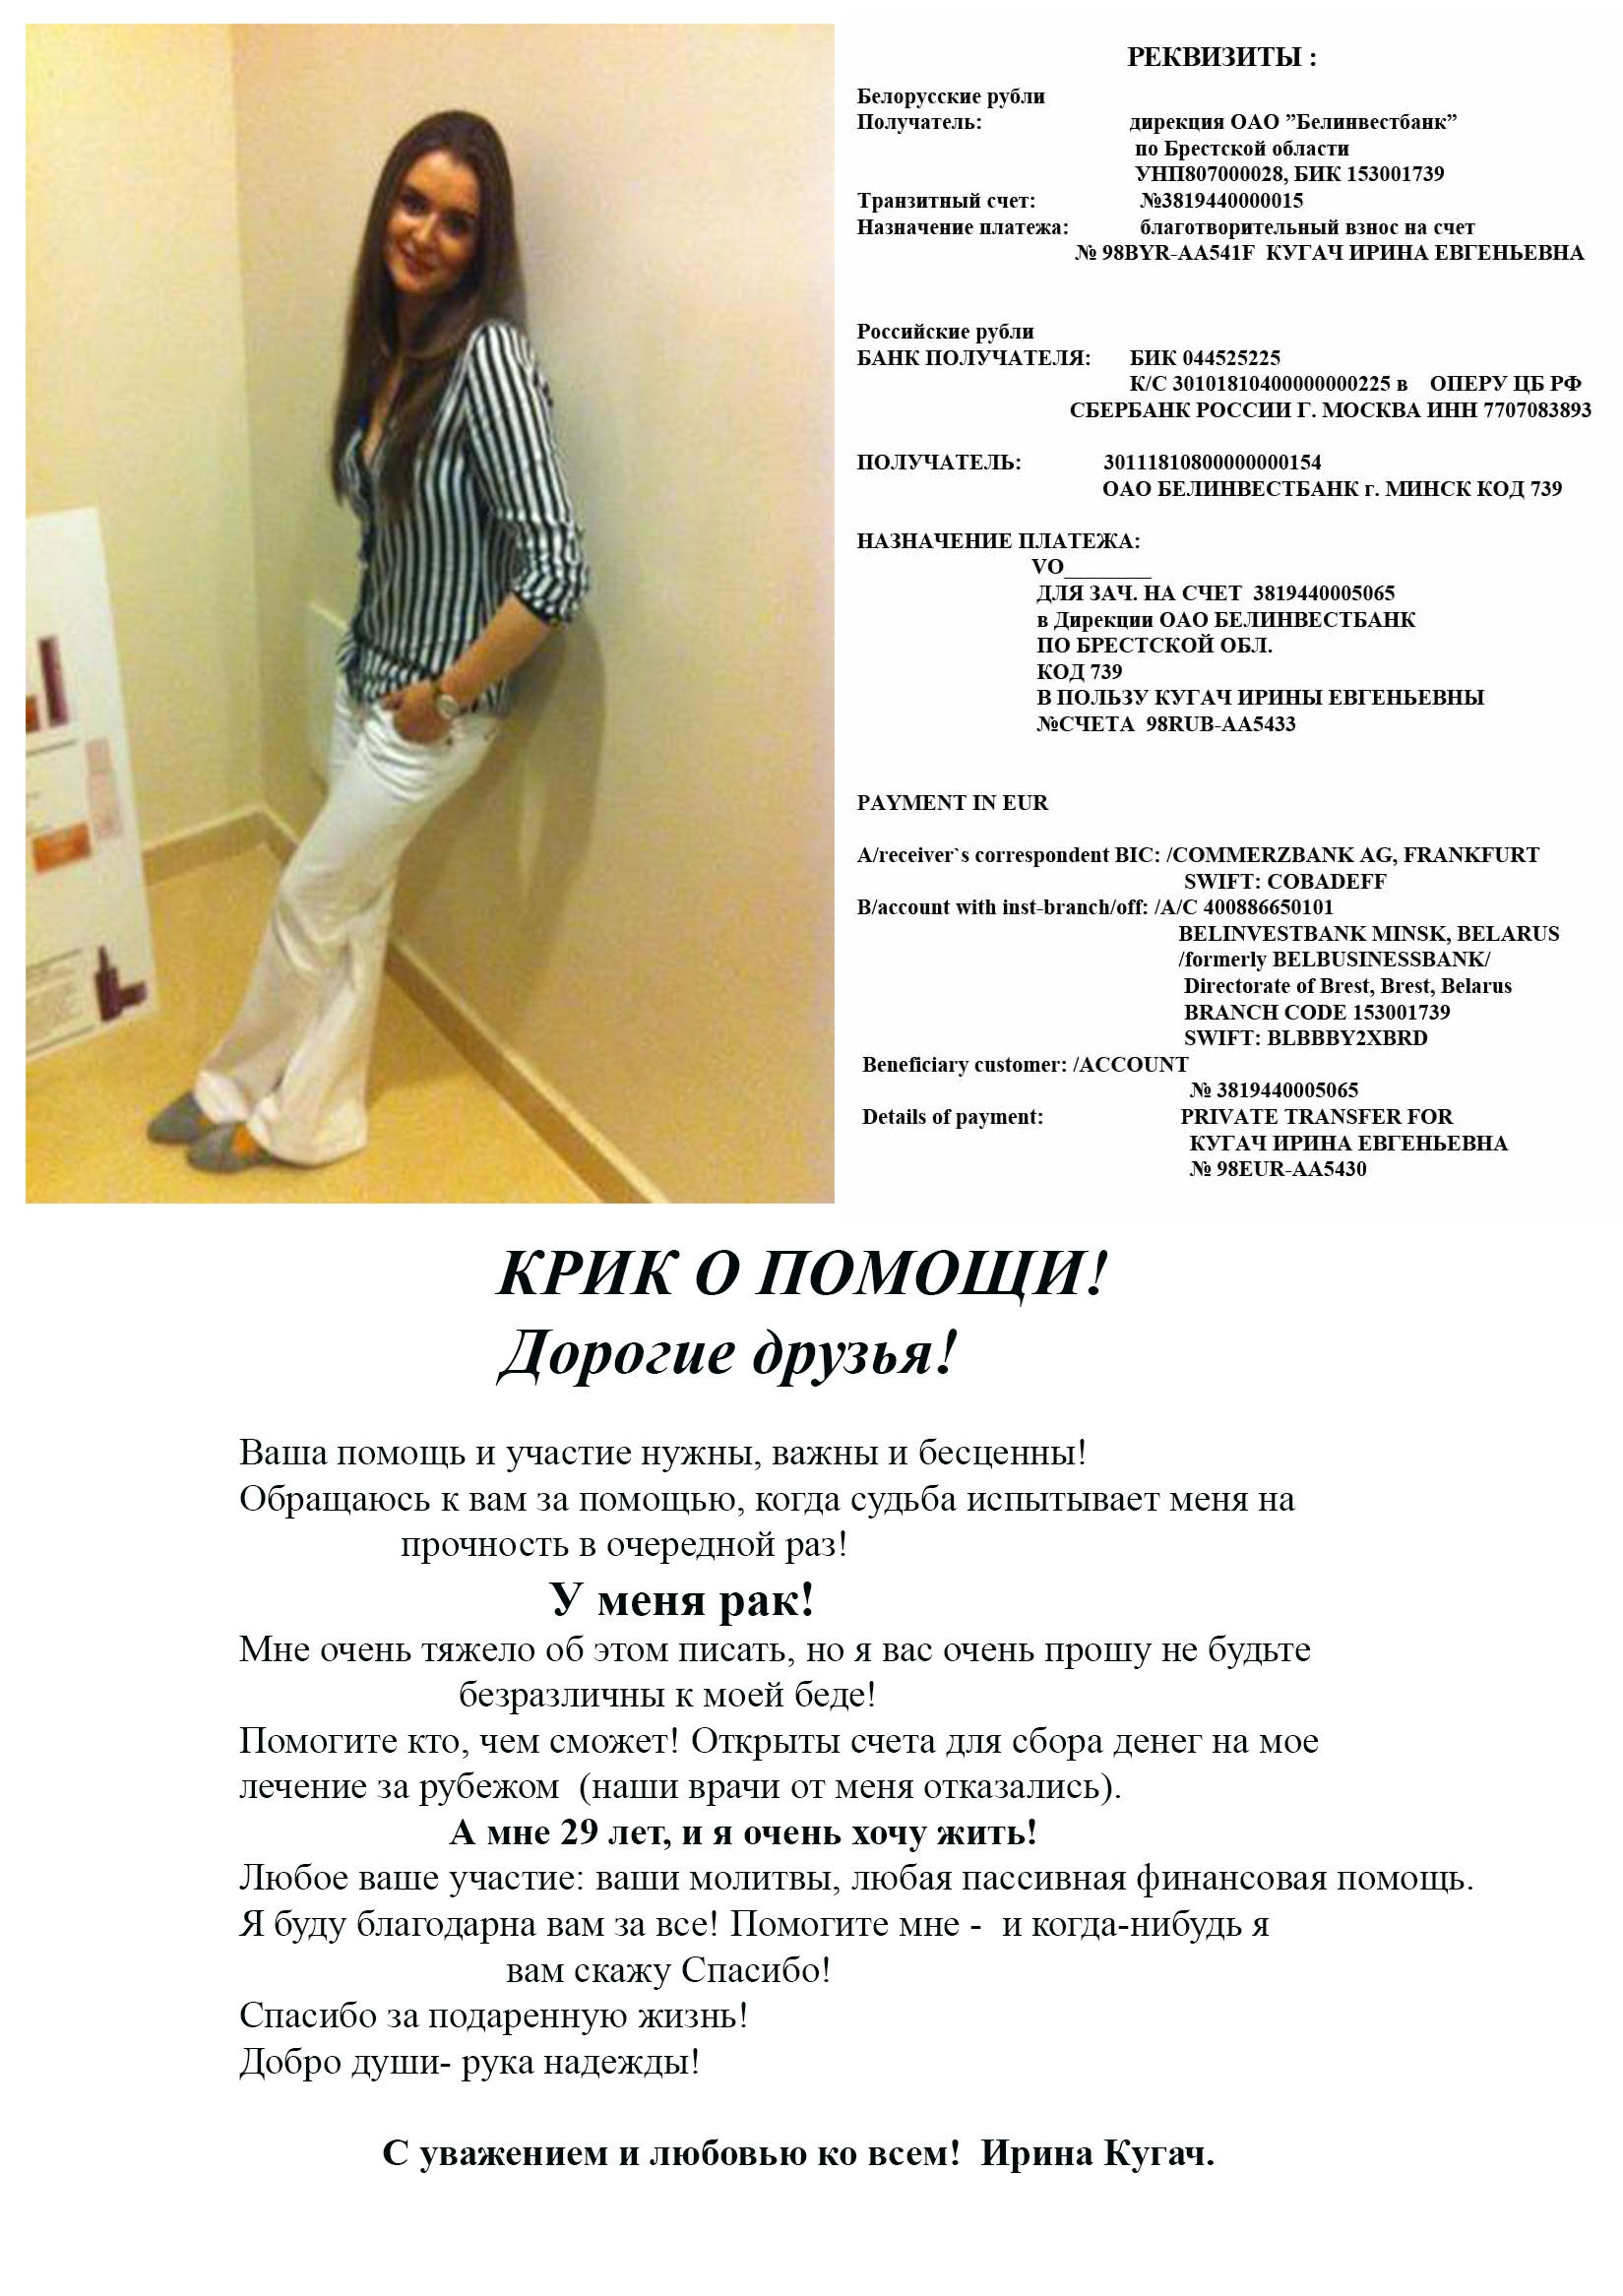 http://sf.uploads.ru/m9Nzd.jpg